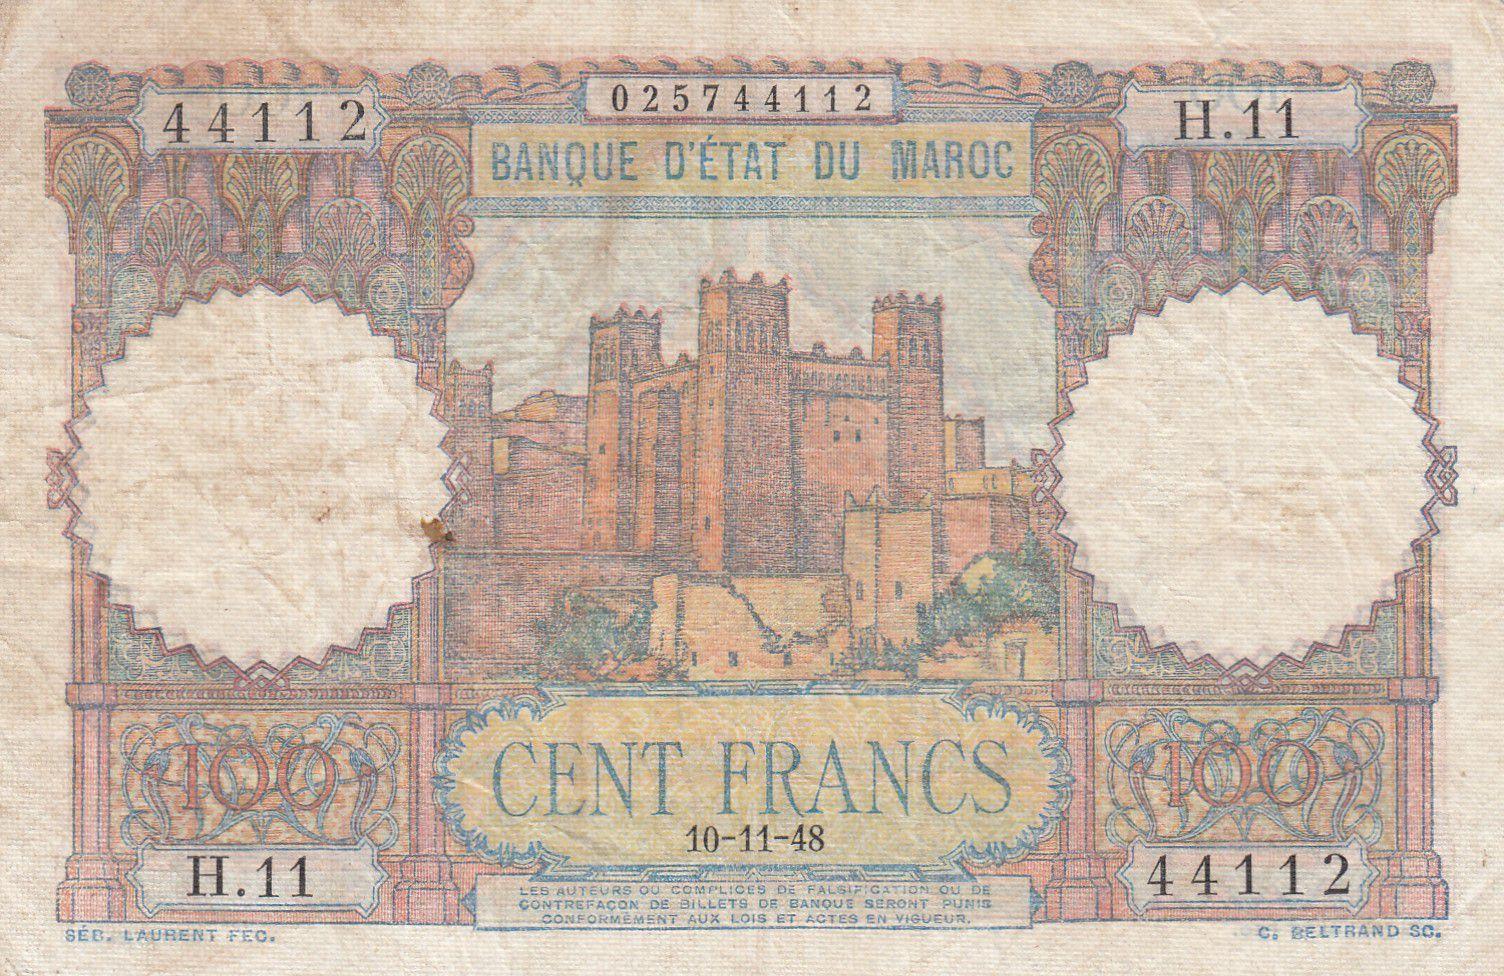 Maroc 100 Francs - Ksar d\'Aït-ben-haddou - 10-11-1948 - TTB - Série H.11 - P.45